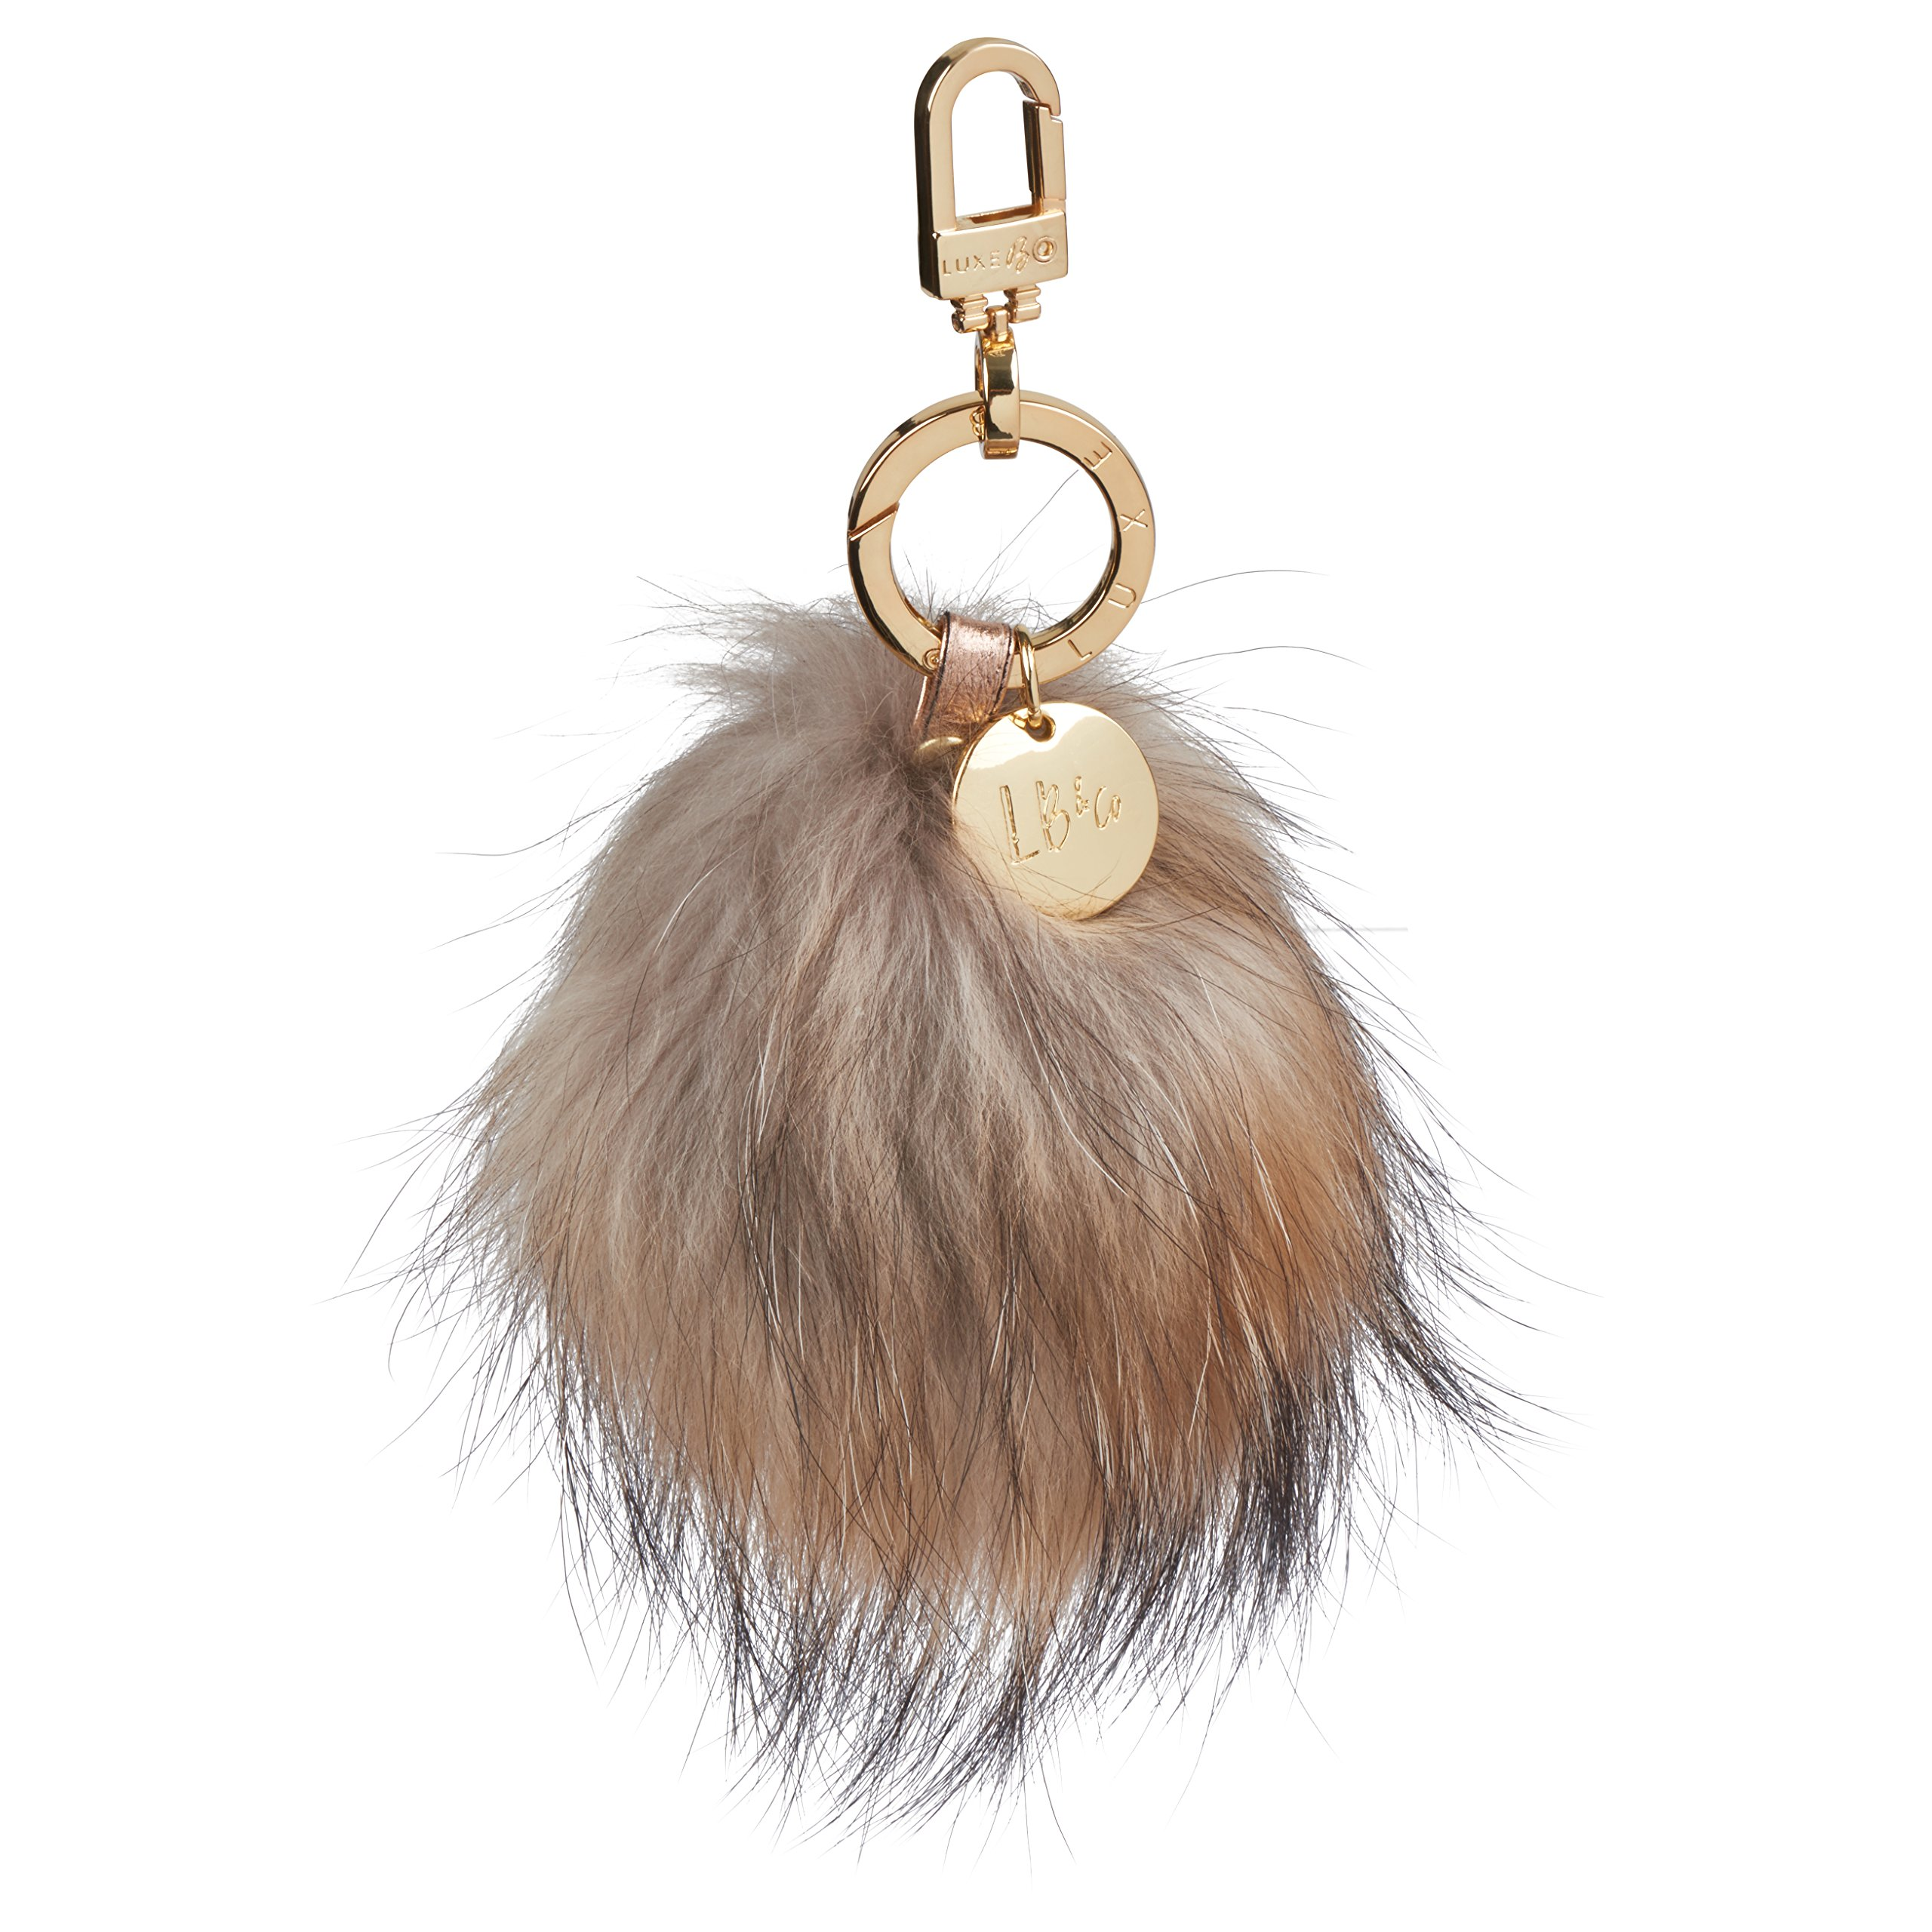 Luxe B Large fur pom pom keychain ball keychain Handbag Fur Bag Charm Fur Pom Pom (Racoon) cute keychain fluffy ball Pom Pom Keychain High-End Fashion Luxury Gold Keychain Diaper Bag Charm by LUXE B